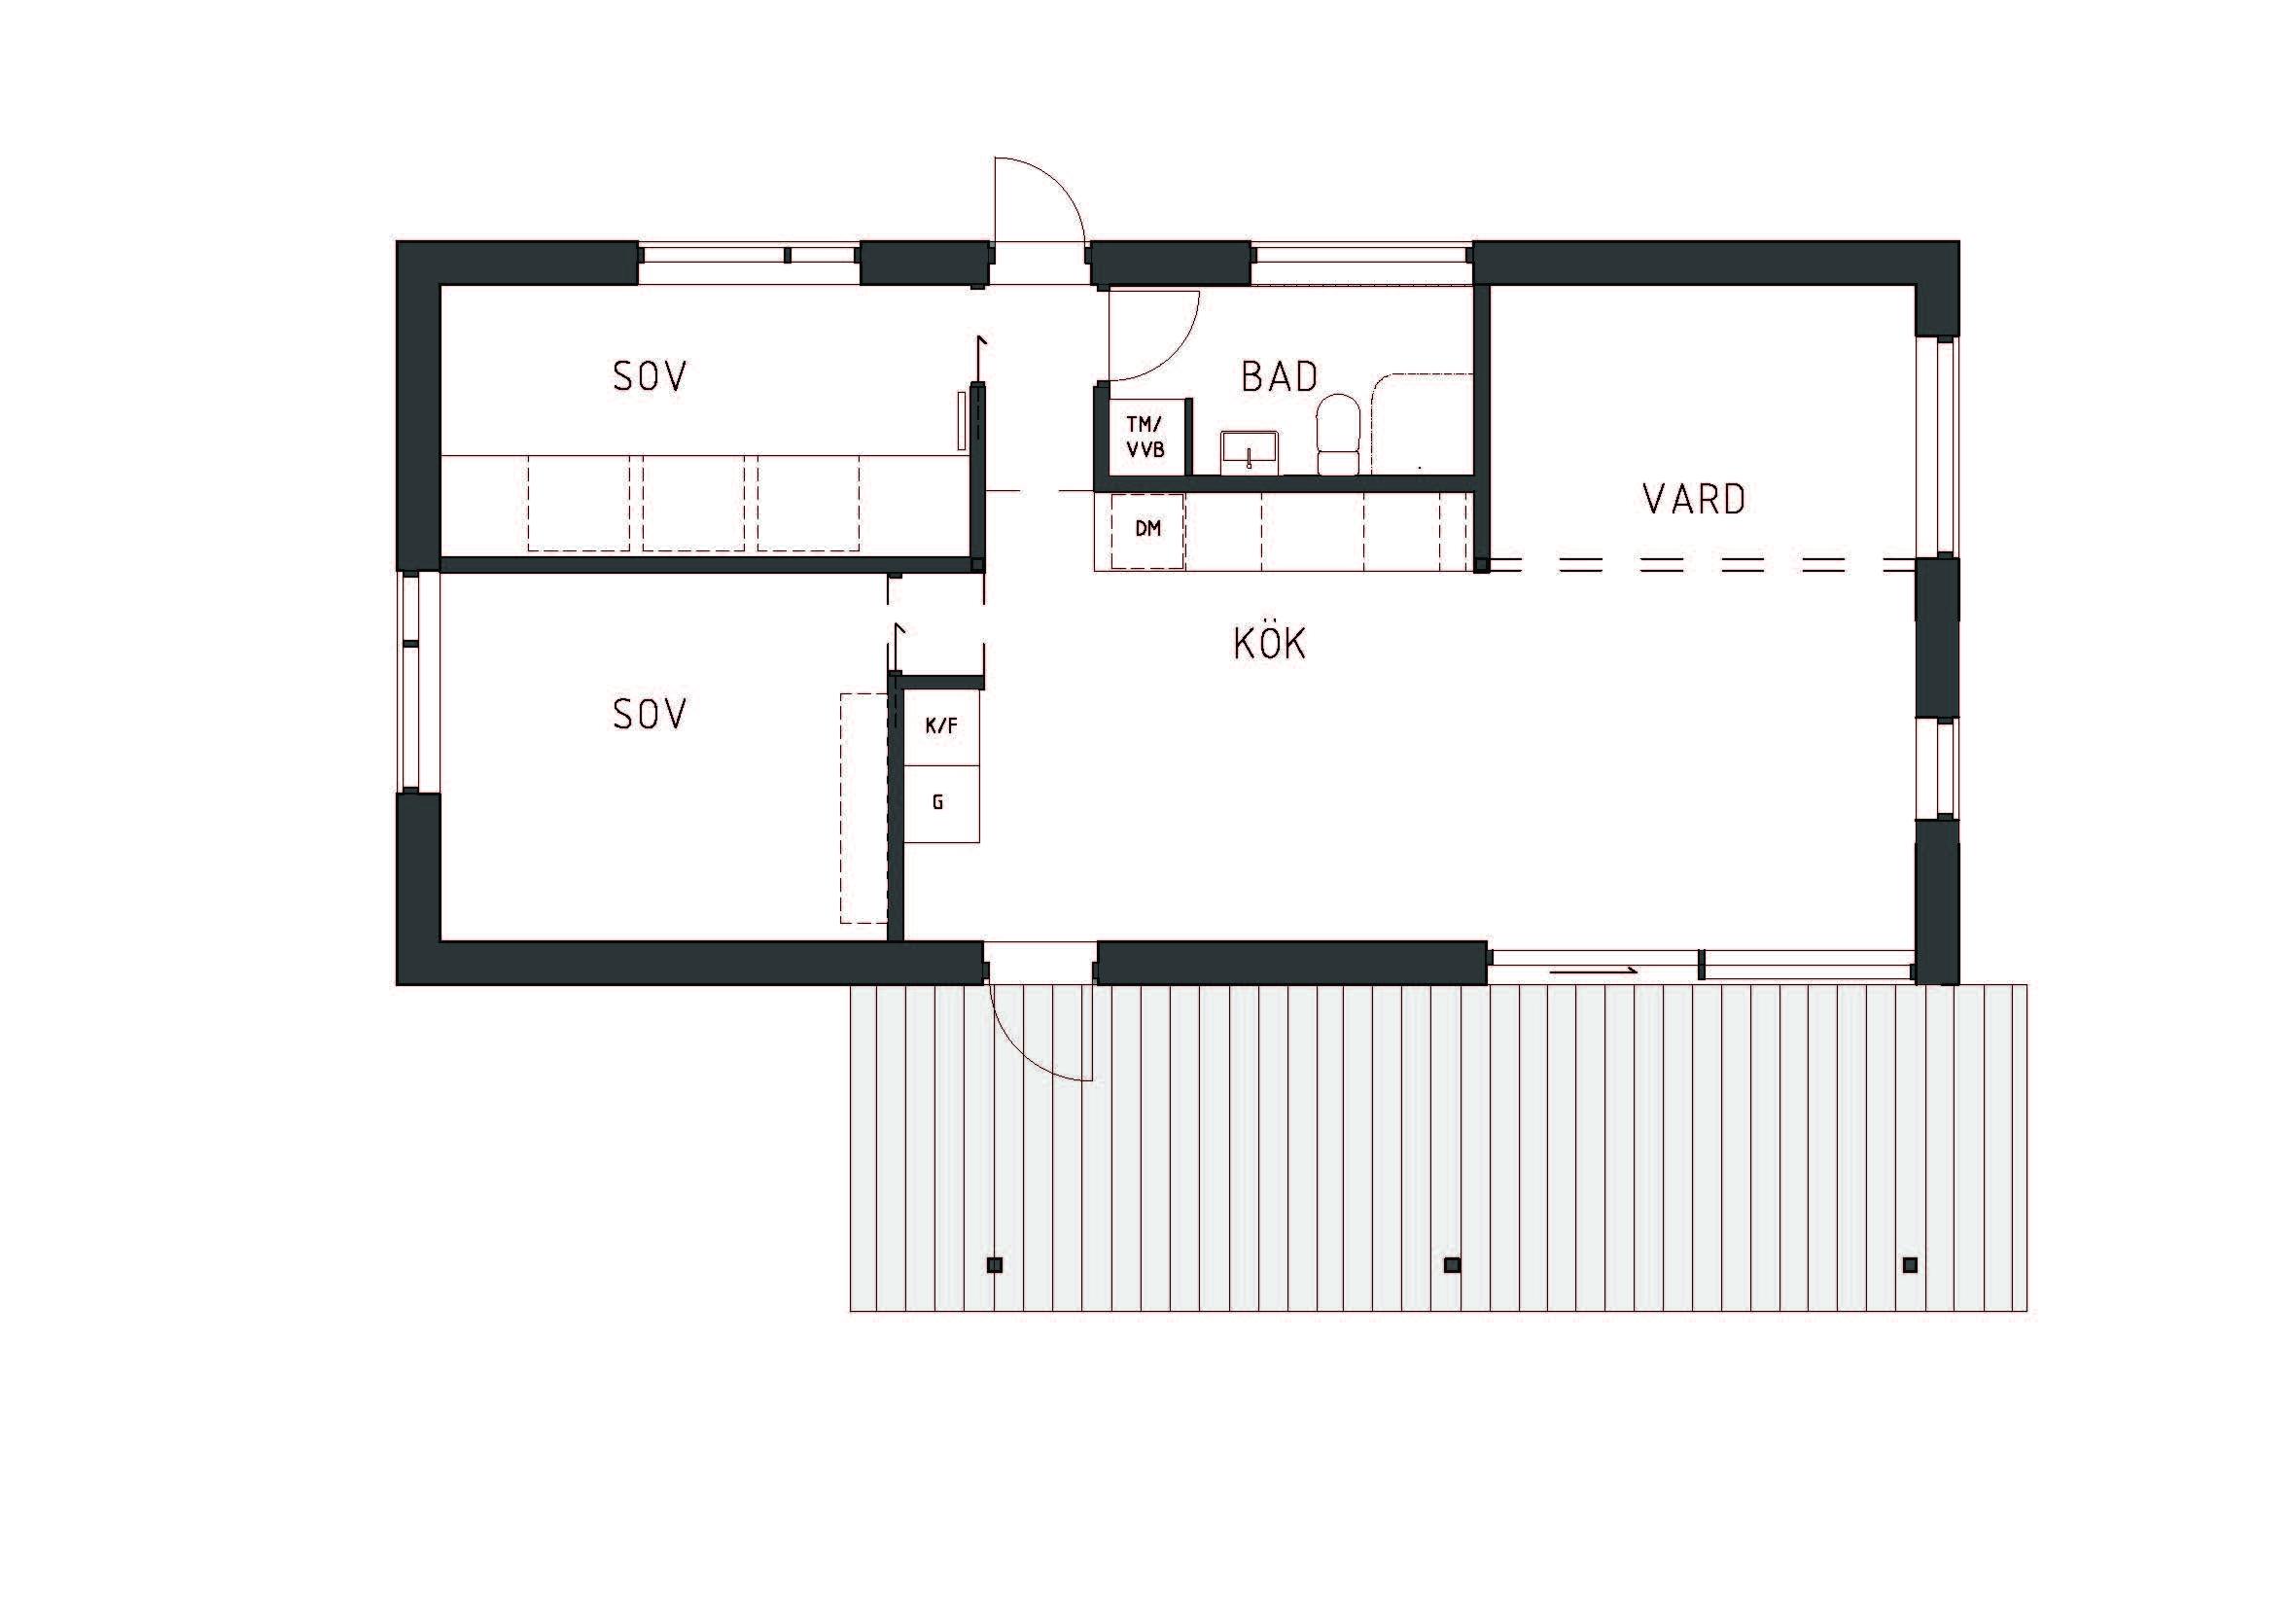 plan1hemsida.jpg